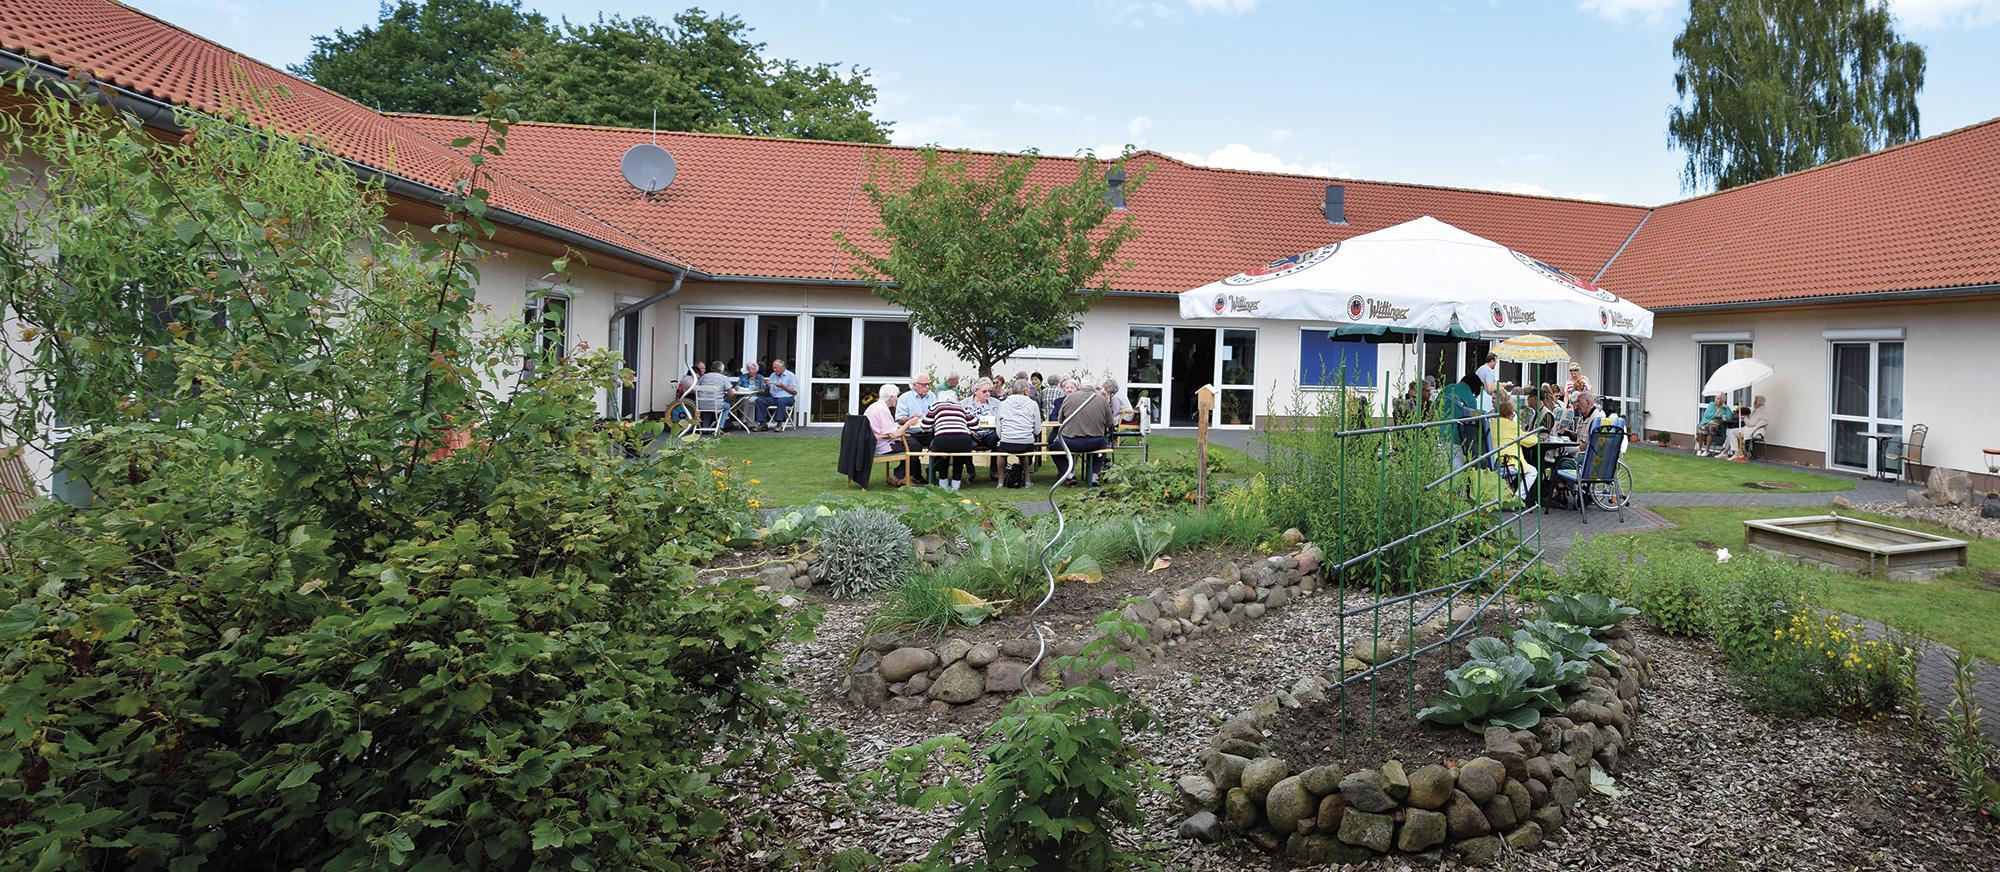 Panorama des Innenhofs